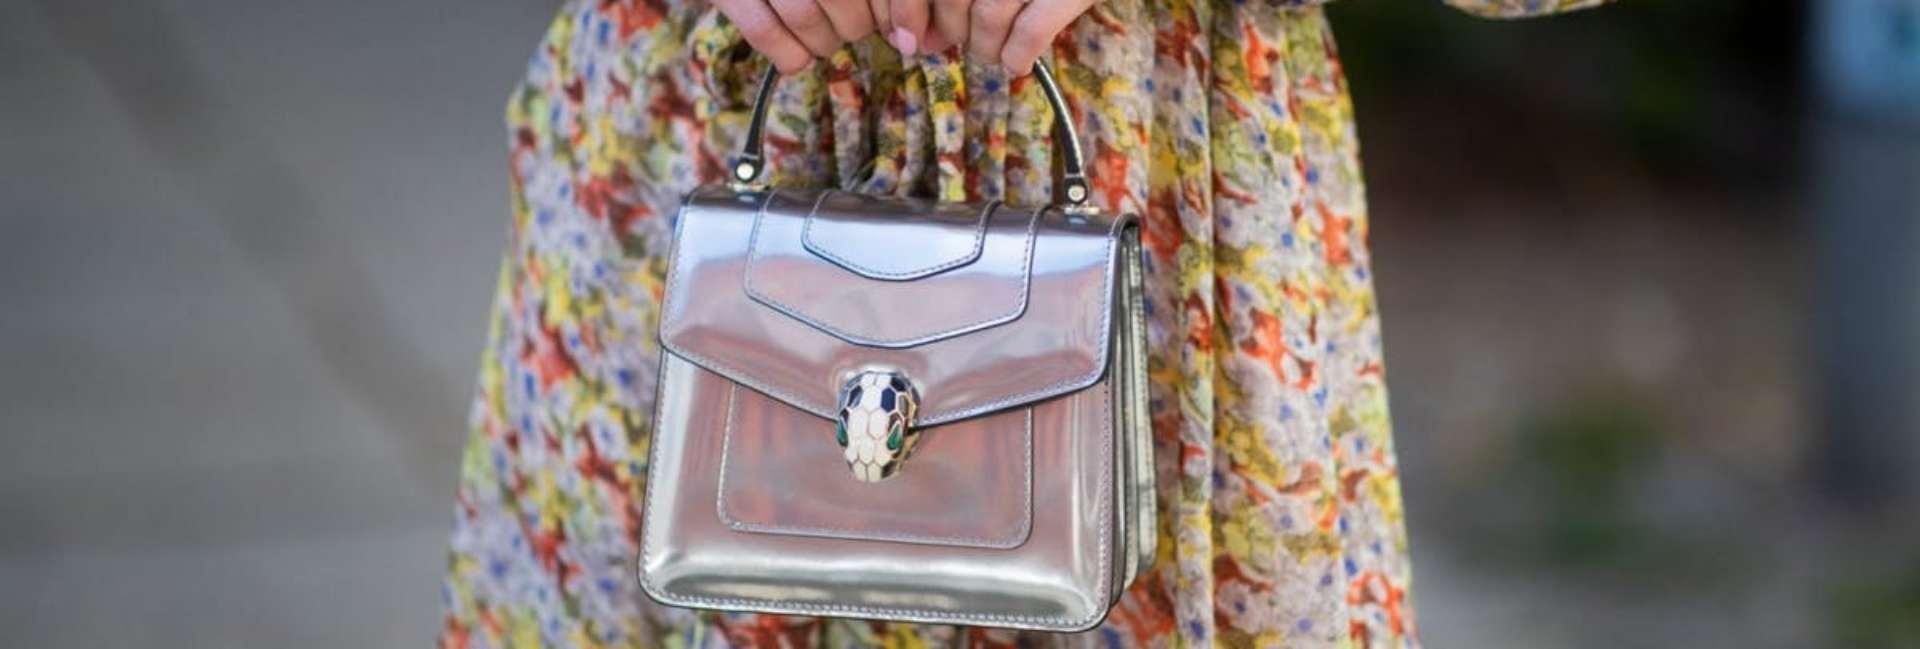 The mini bags trend